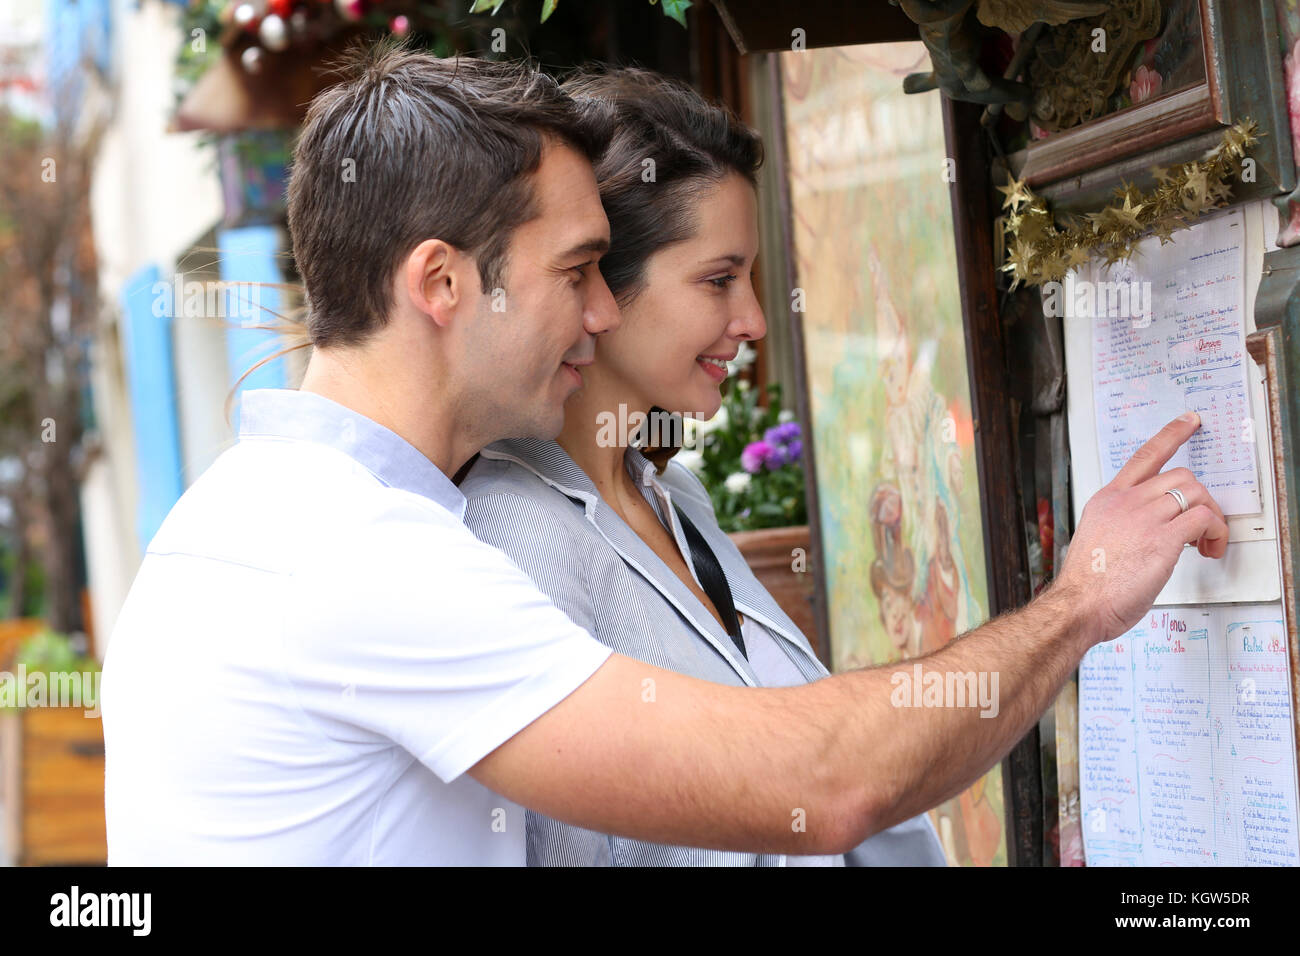 Couple in Paris looking at restaurant menu - Stock Image